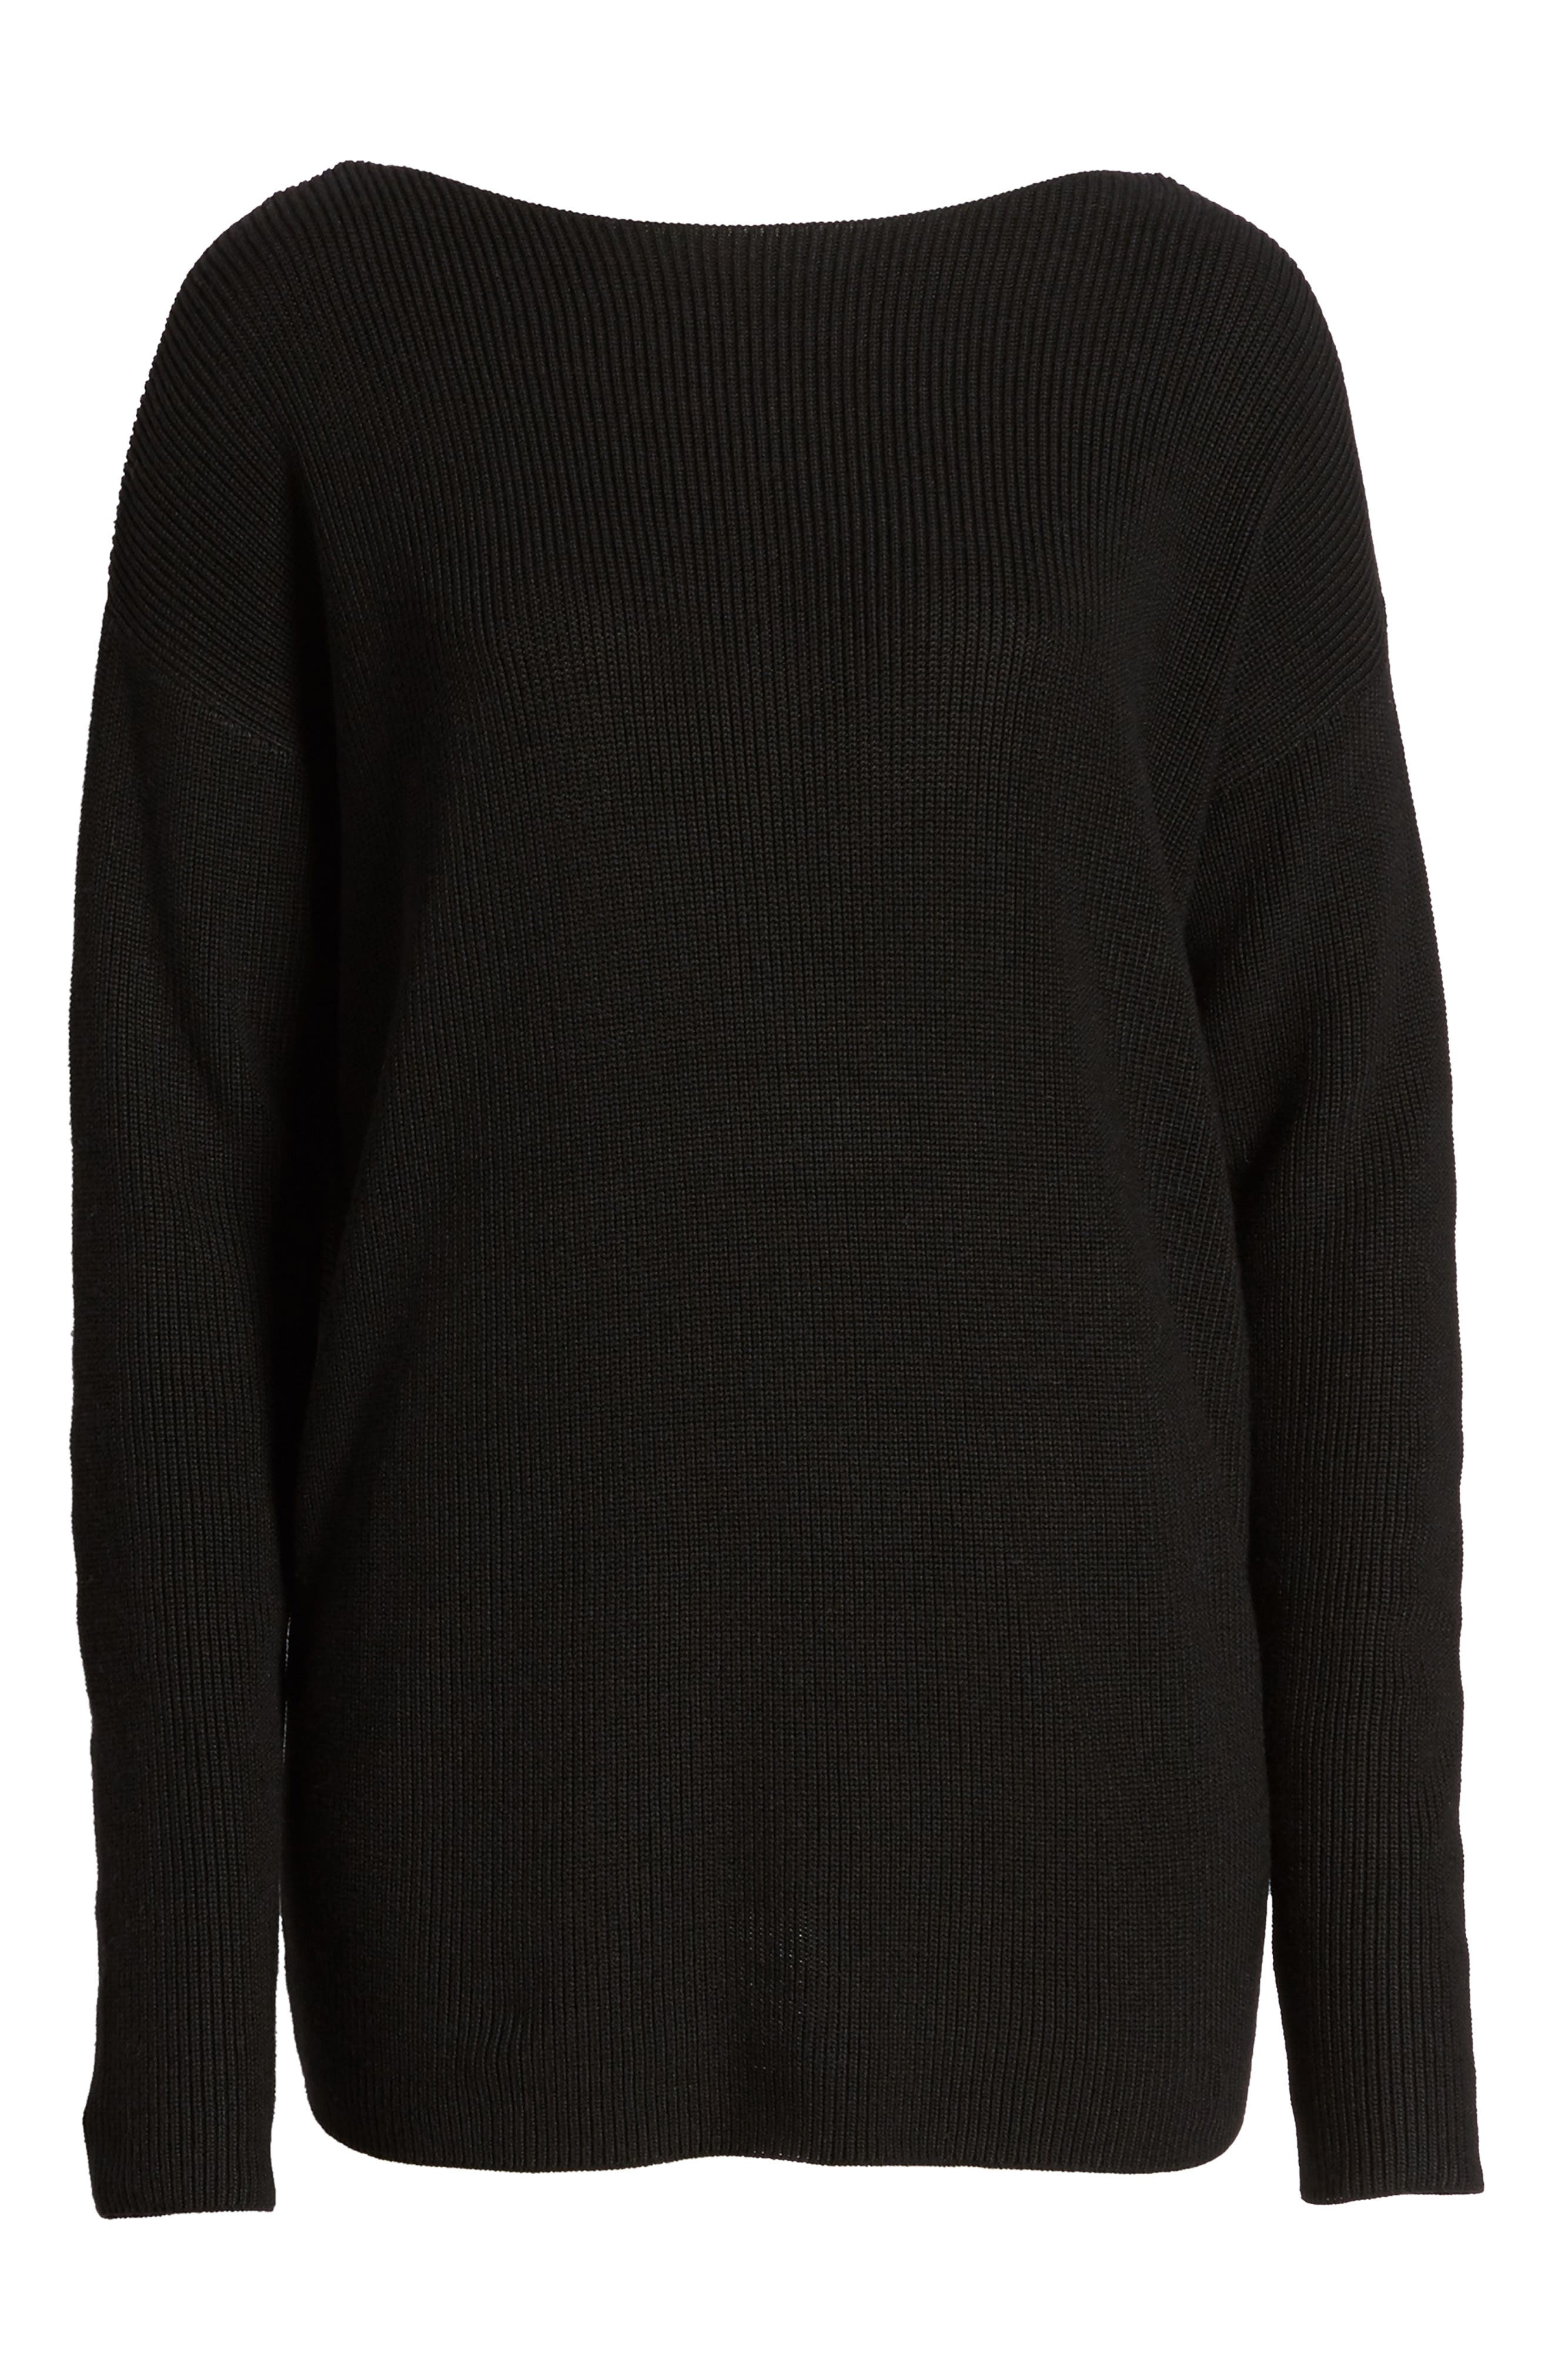 Twist Back Sweater,                             Alternate thumbnail 6, color,                             Black